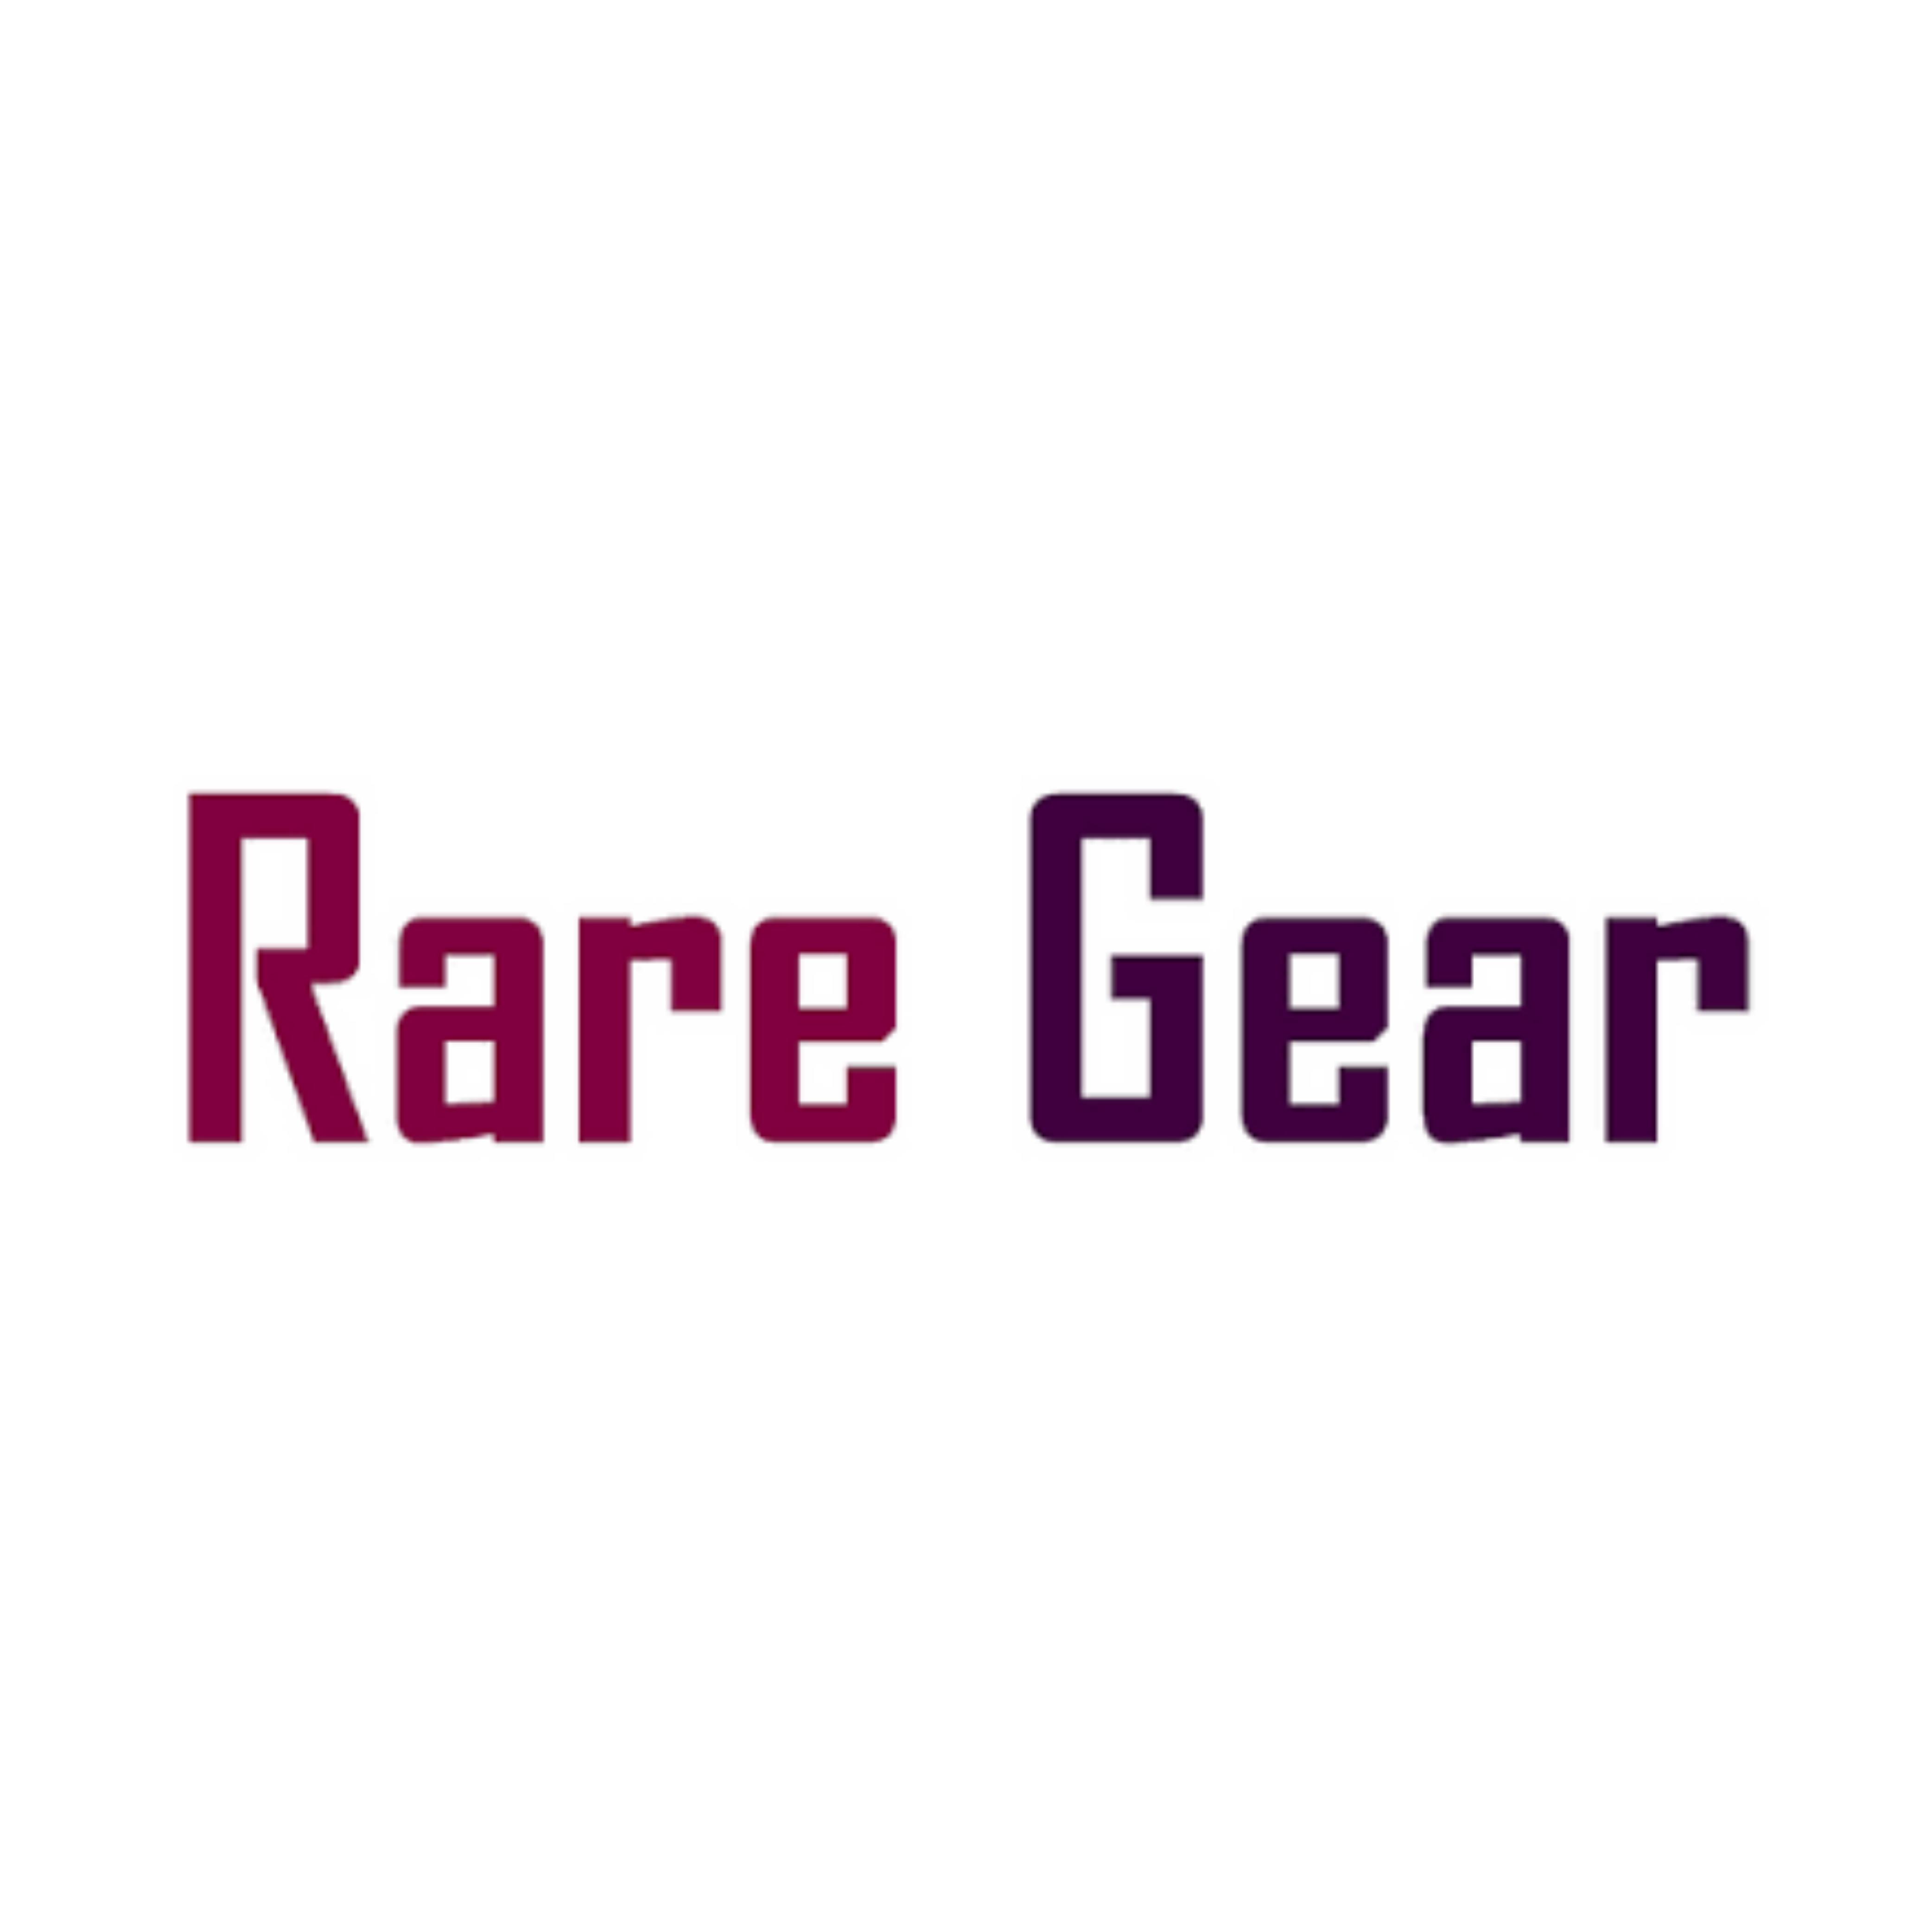 Rare Gear